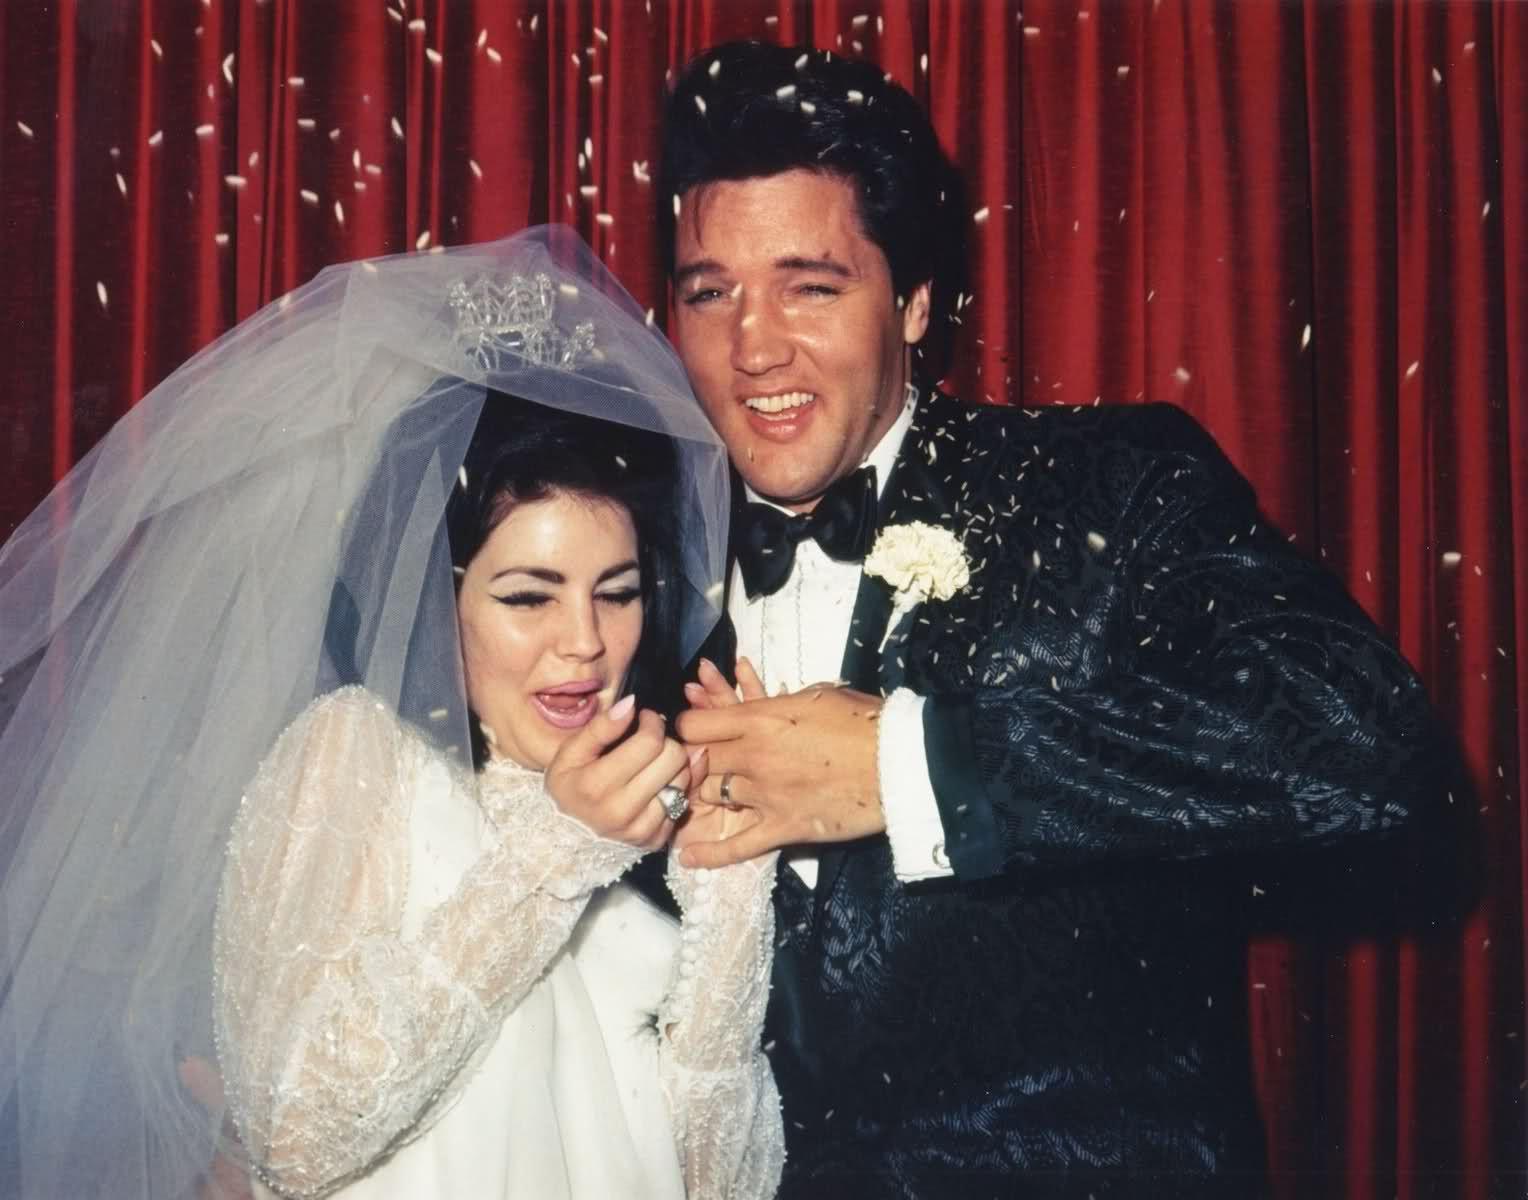 Elv1s Priscilla S Wedding Notice That Priscilla Has The Horseshoe Matching Engagement Ring On Priscilla Presley Wedding Elvis Presley Priscilla Elvis Wedding